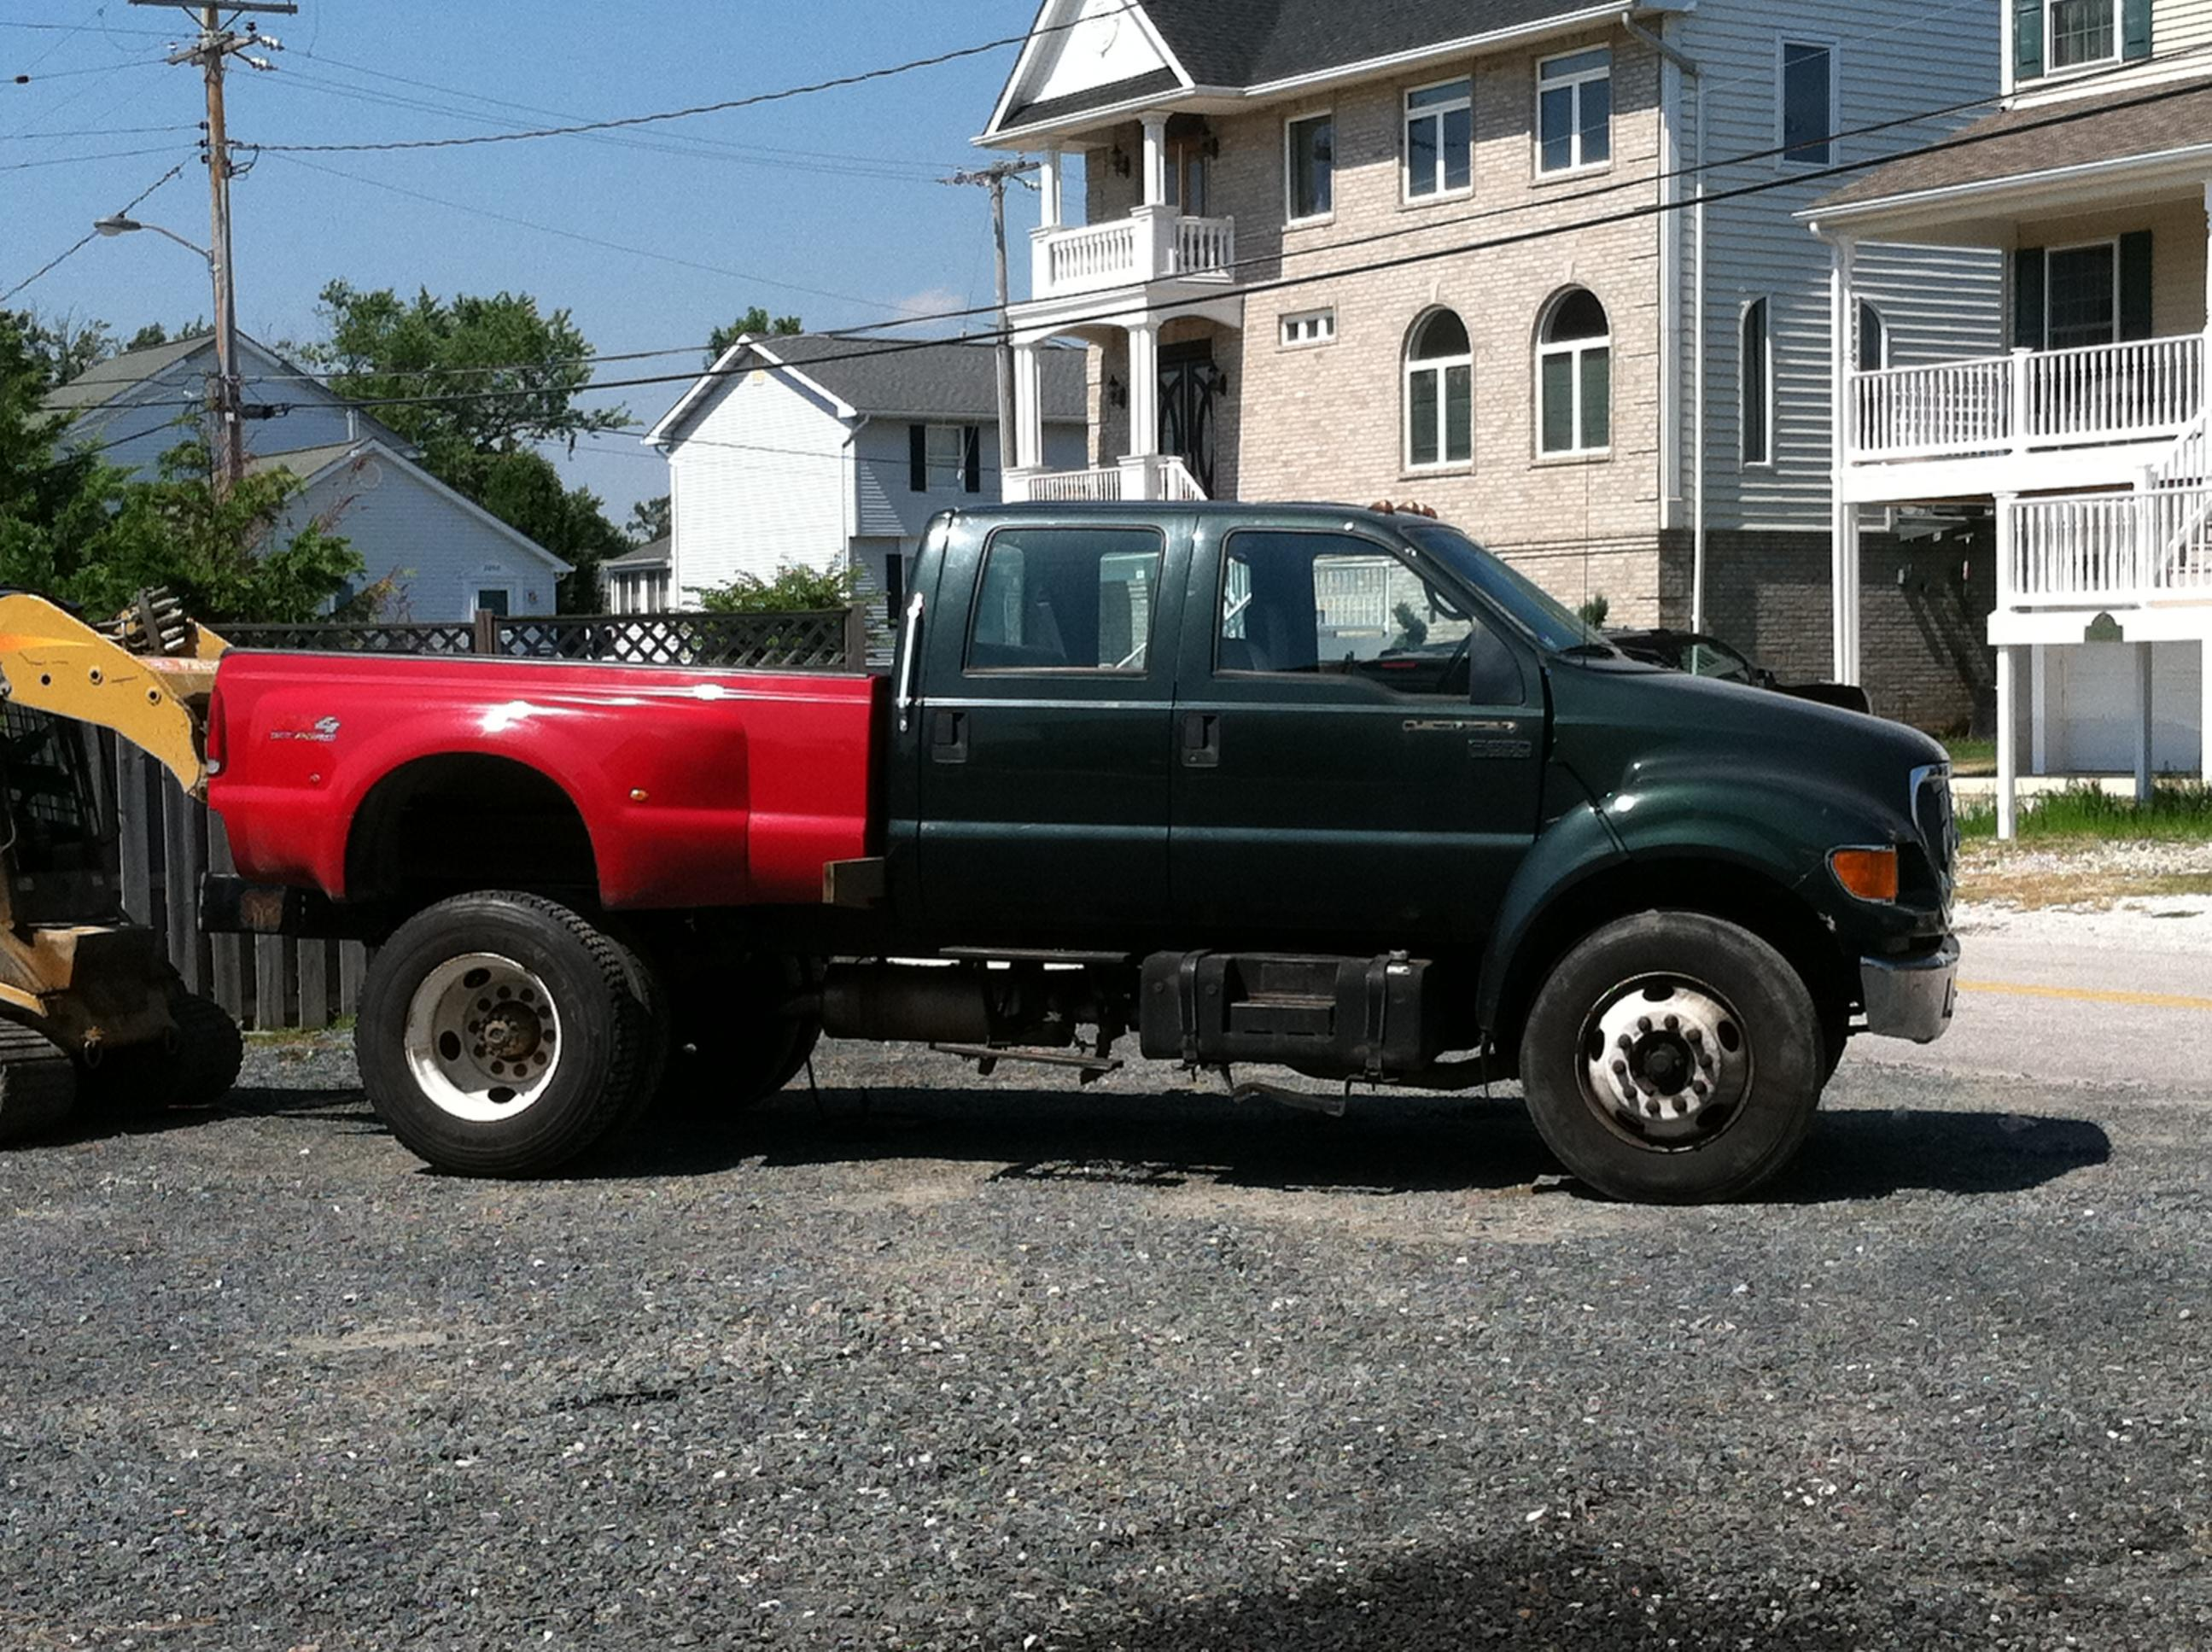 ford f for hennessey raptor door news velociraptor truck vehicles sale performance recent